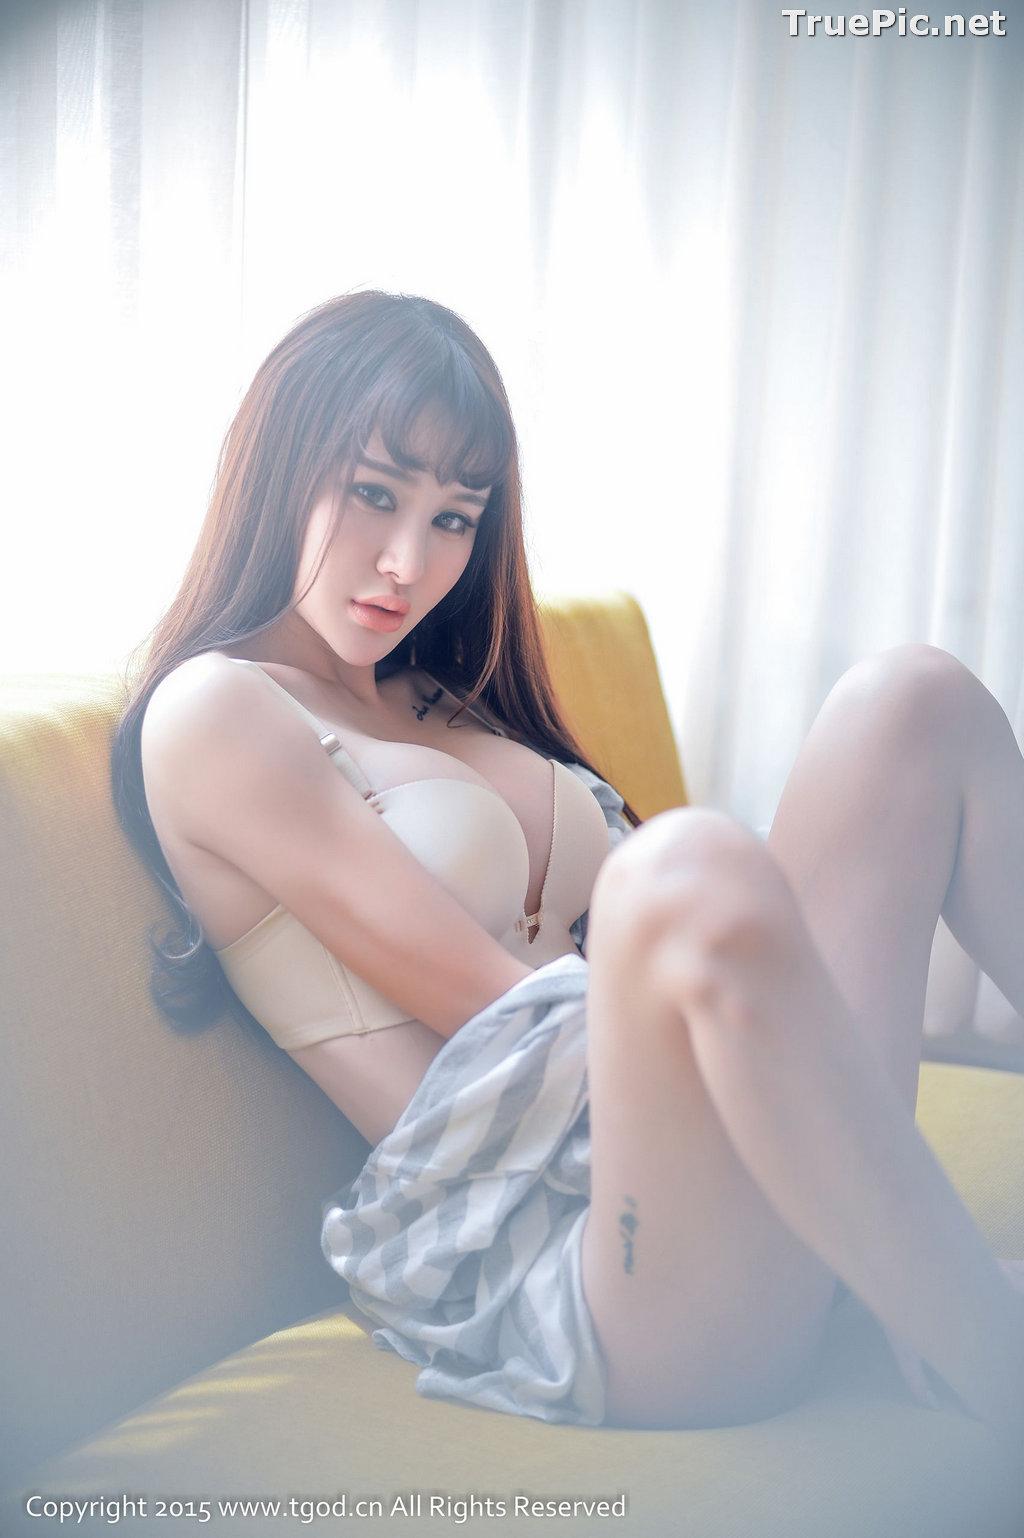 Image TGOD 2015-11-10 - Chinese Sexy Model - Cheryl (青树) - TruePic.net - Picture-8